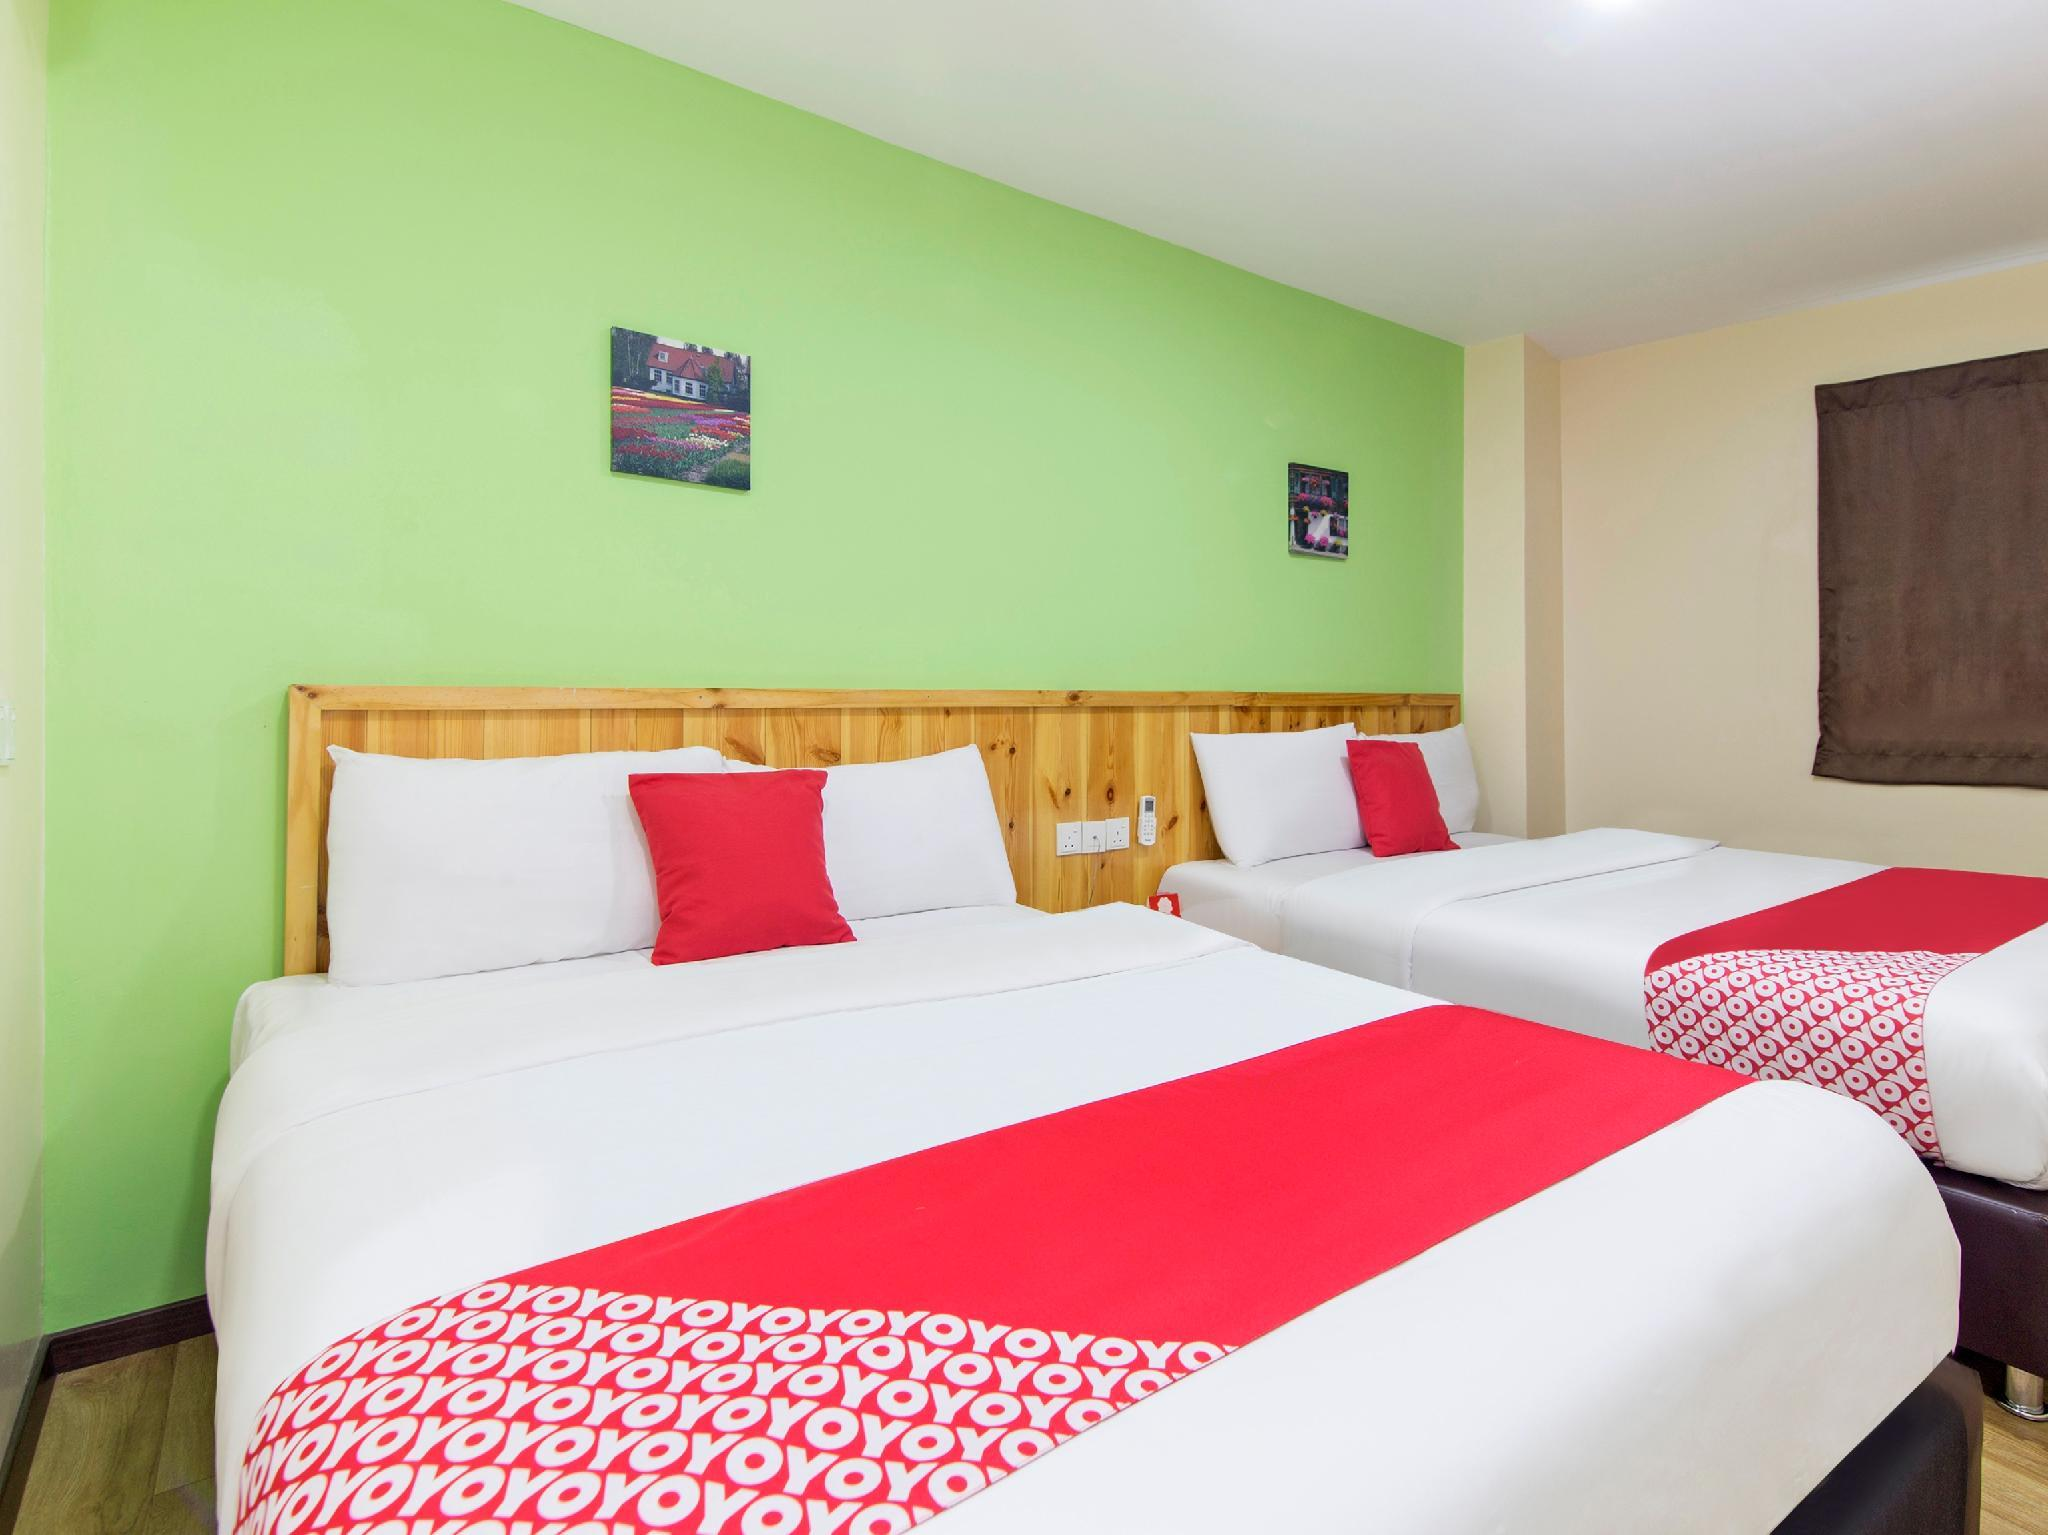 Oyo 328 Apple Hotel Shah Alam Booking Deals 2019 Promos